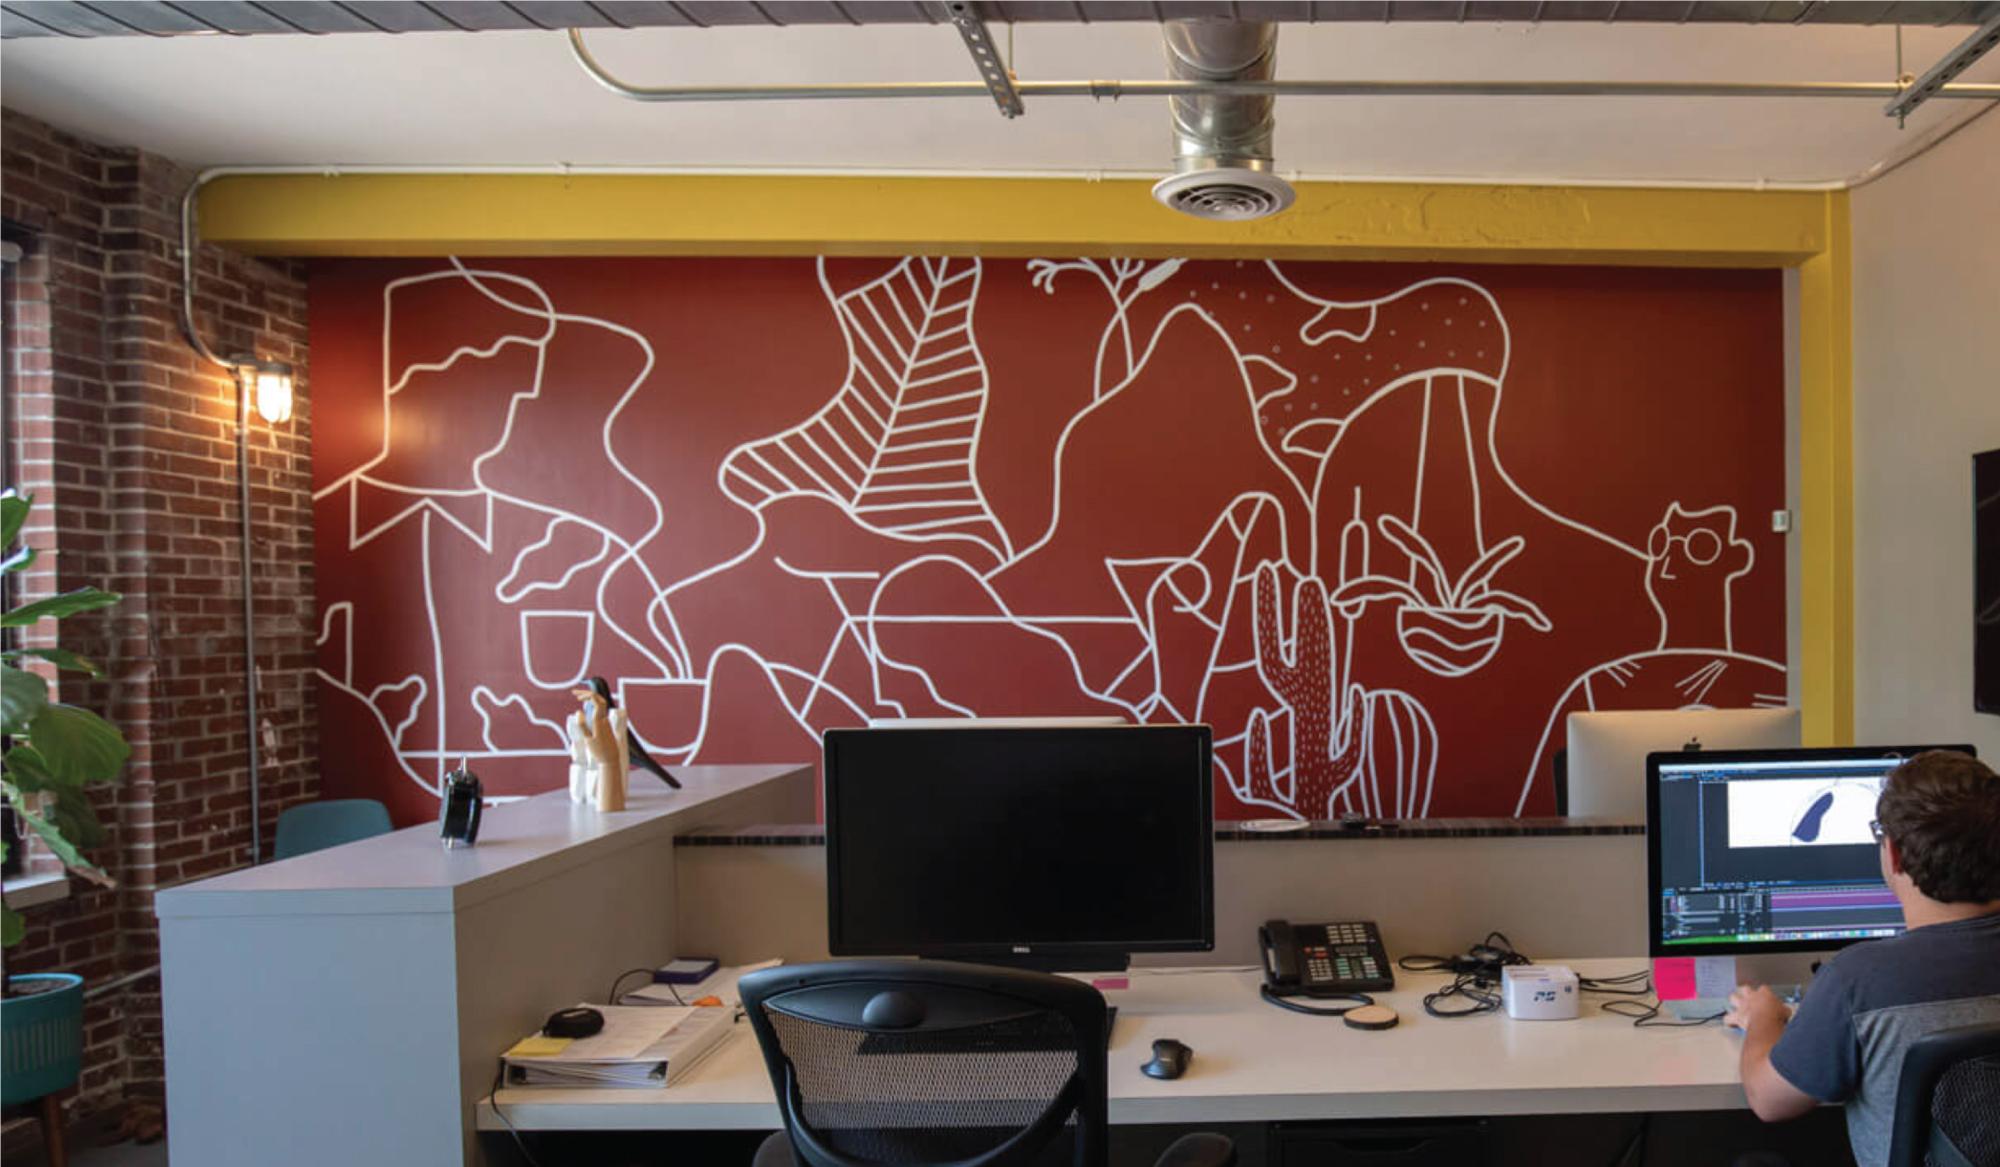 Mural-image-1.jpg